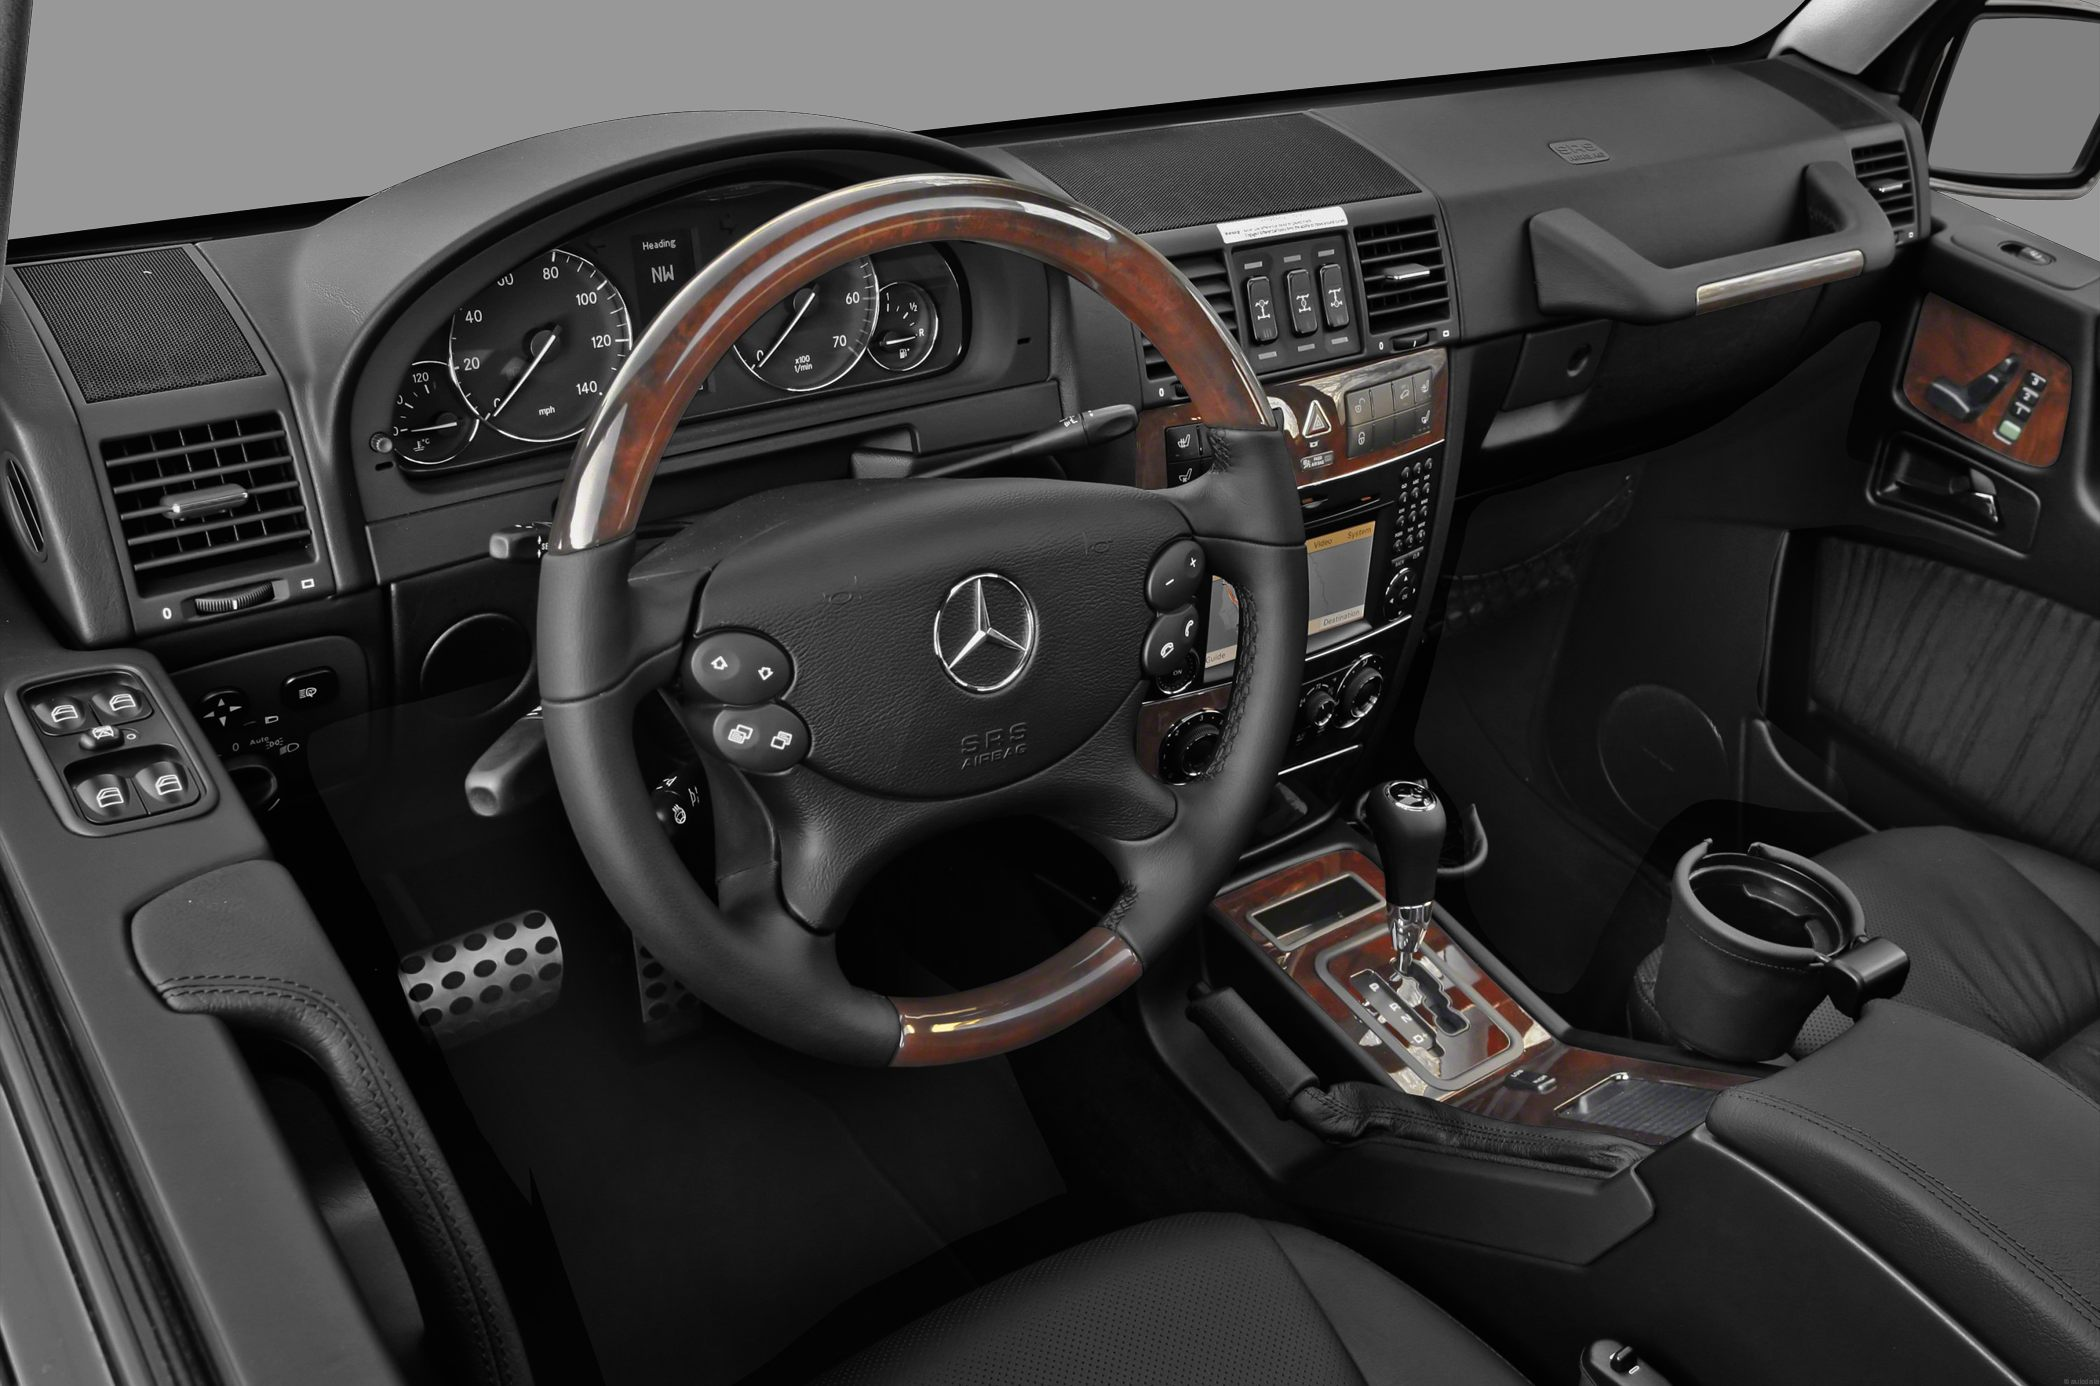 mercedes benz g class 14 - G Wagon Interior